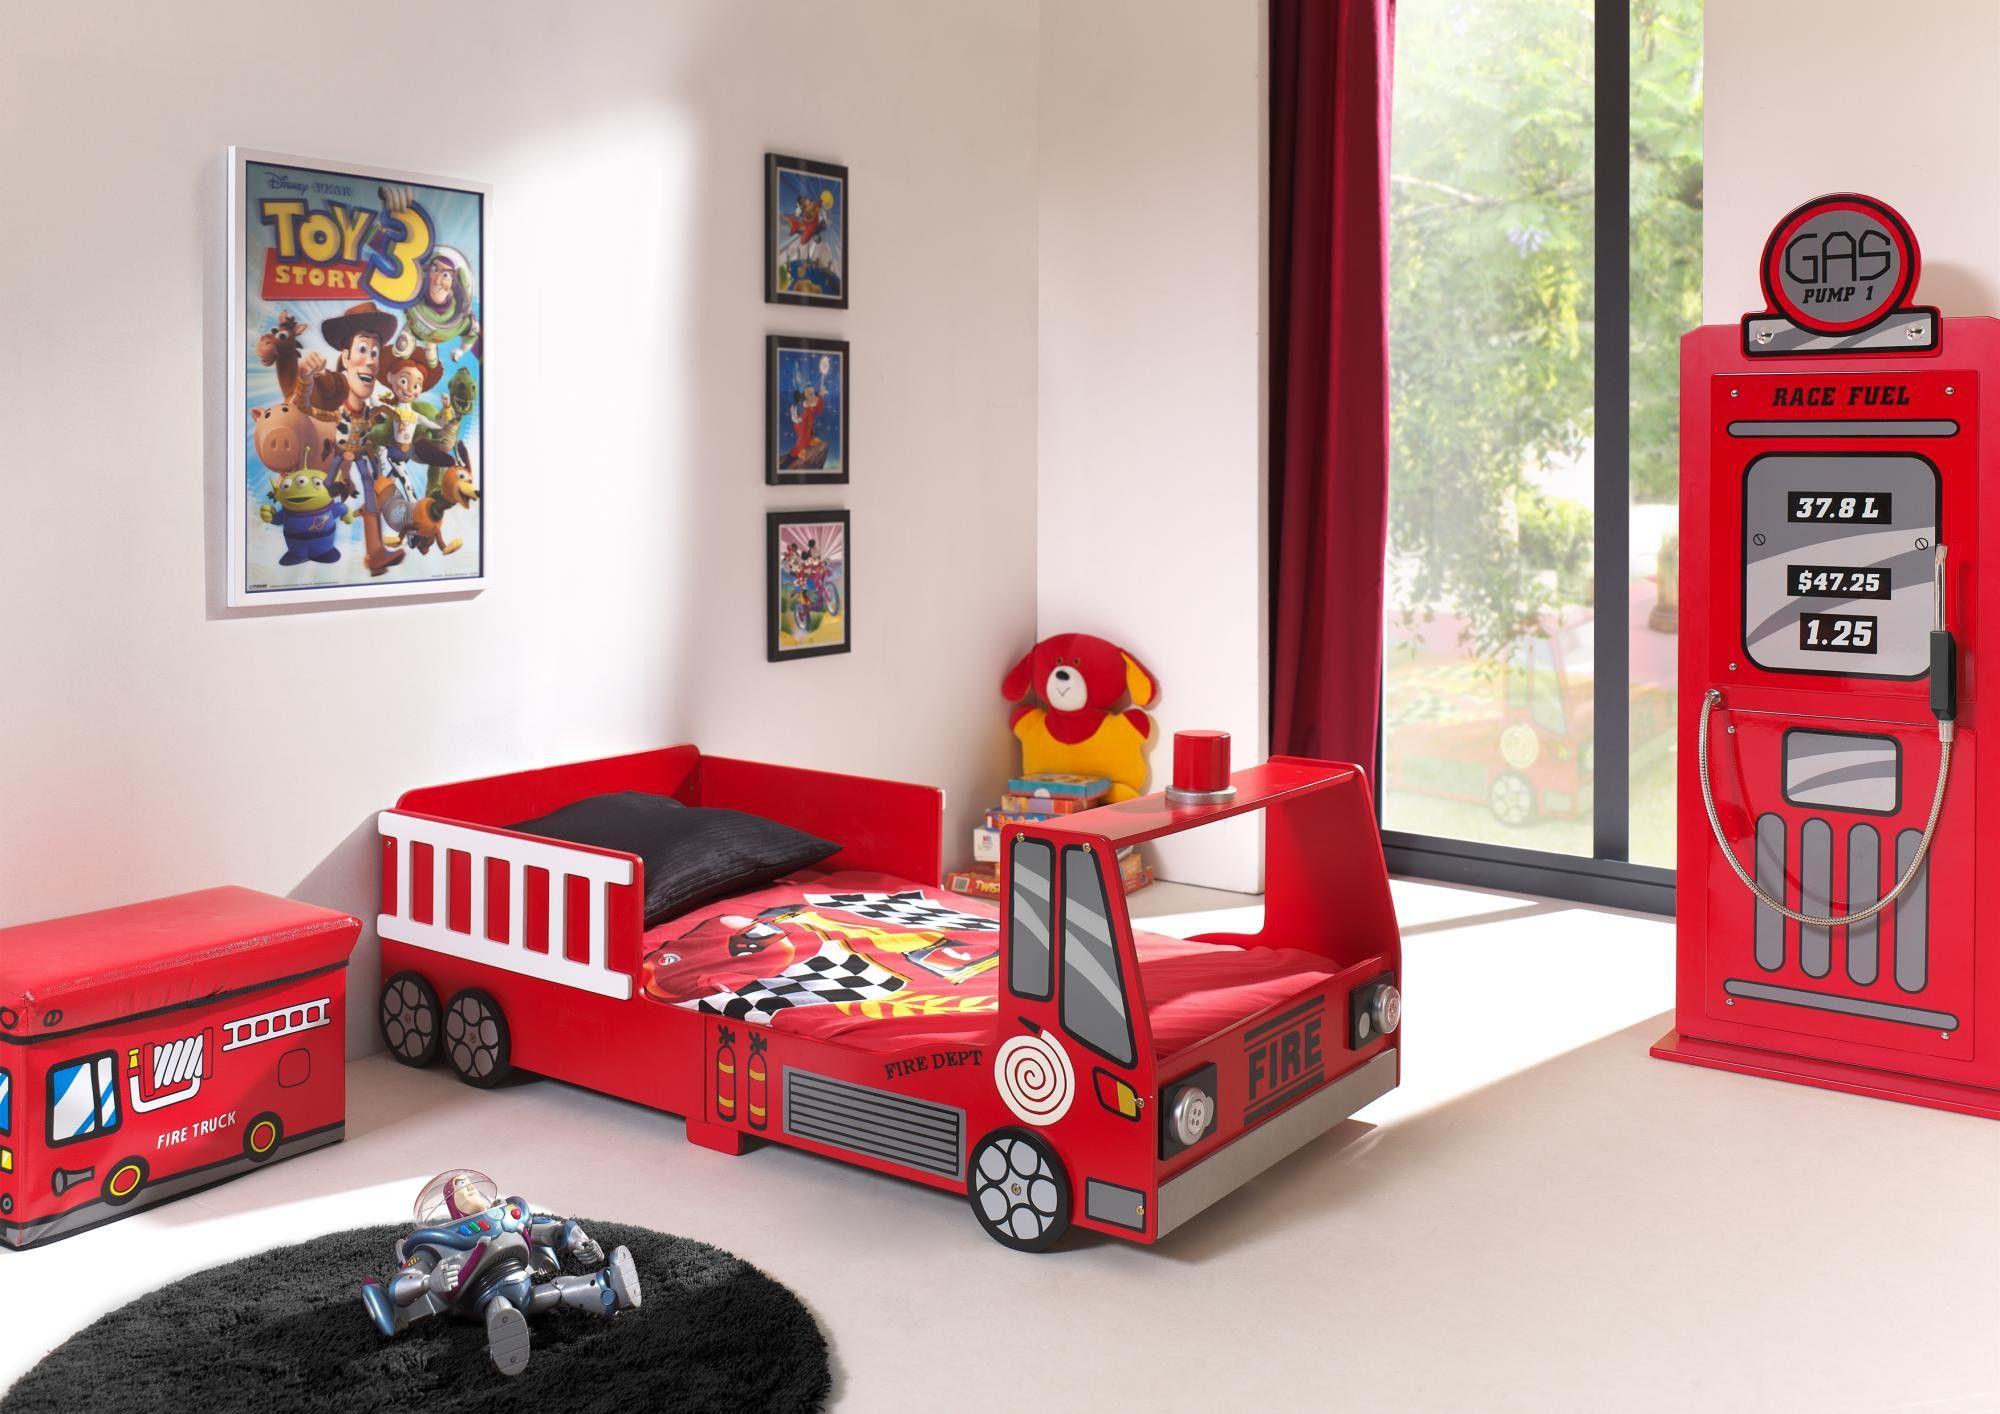 Lit voiture enfant SleepCar 324 67€